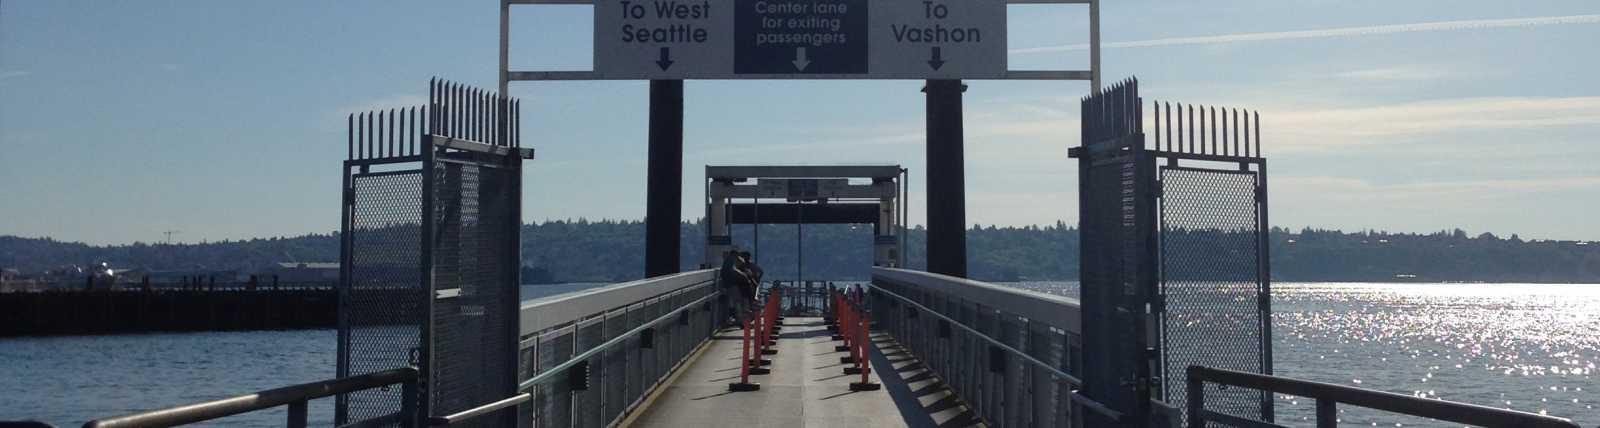 King County Water Taxi - Vashon Island